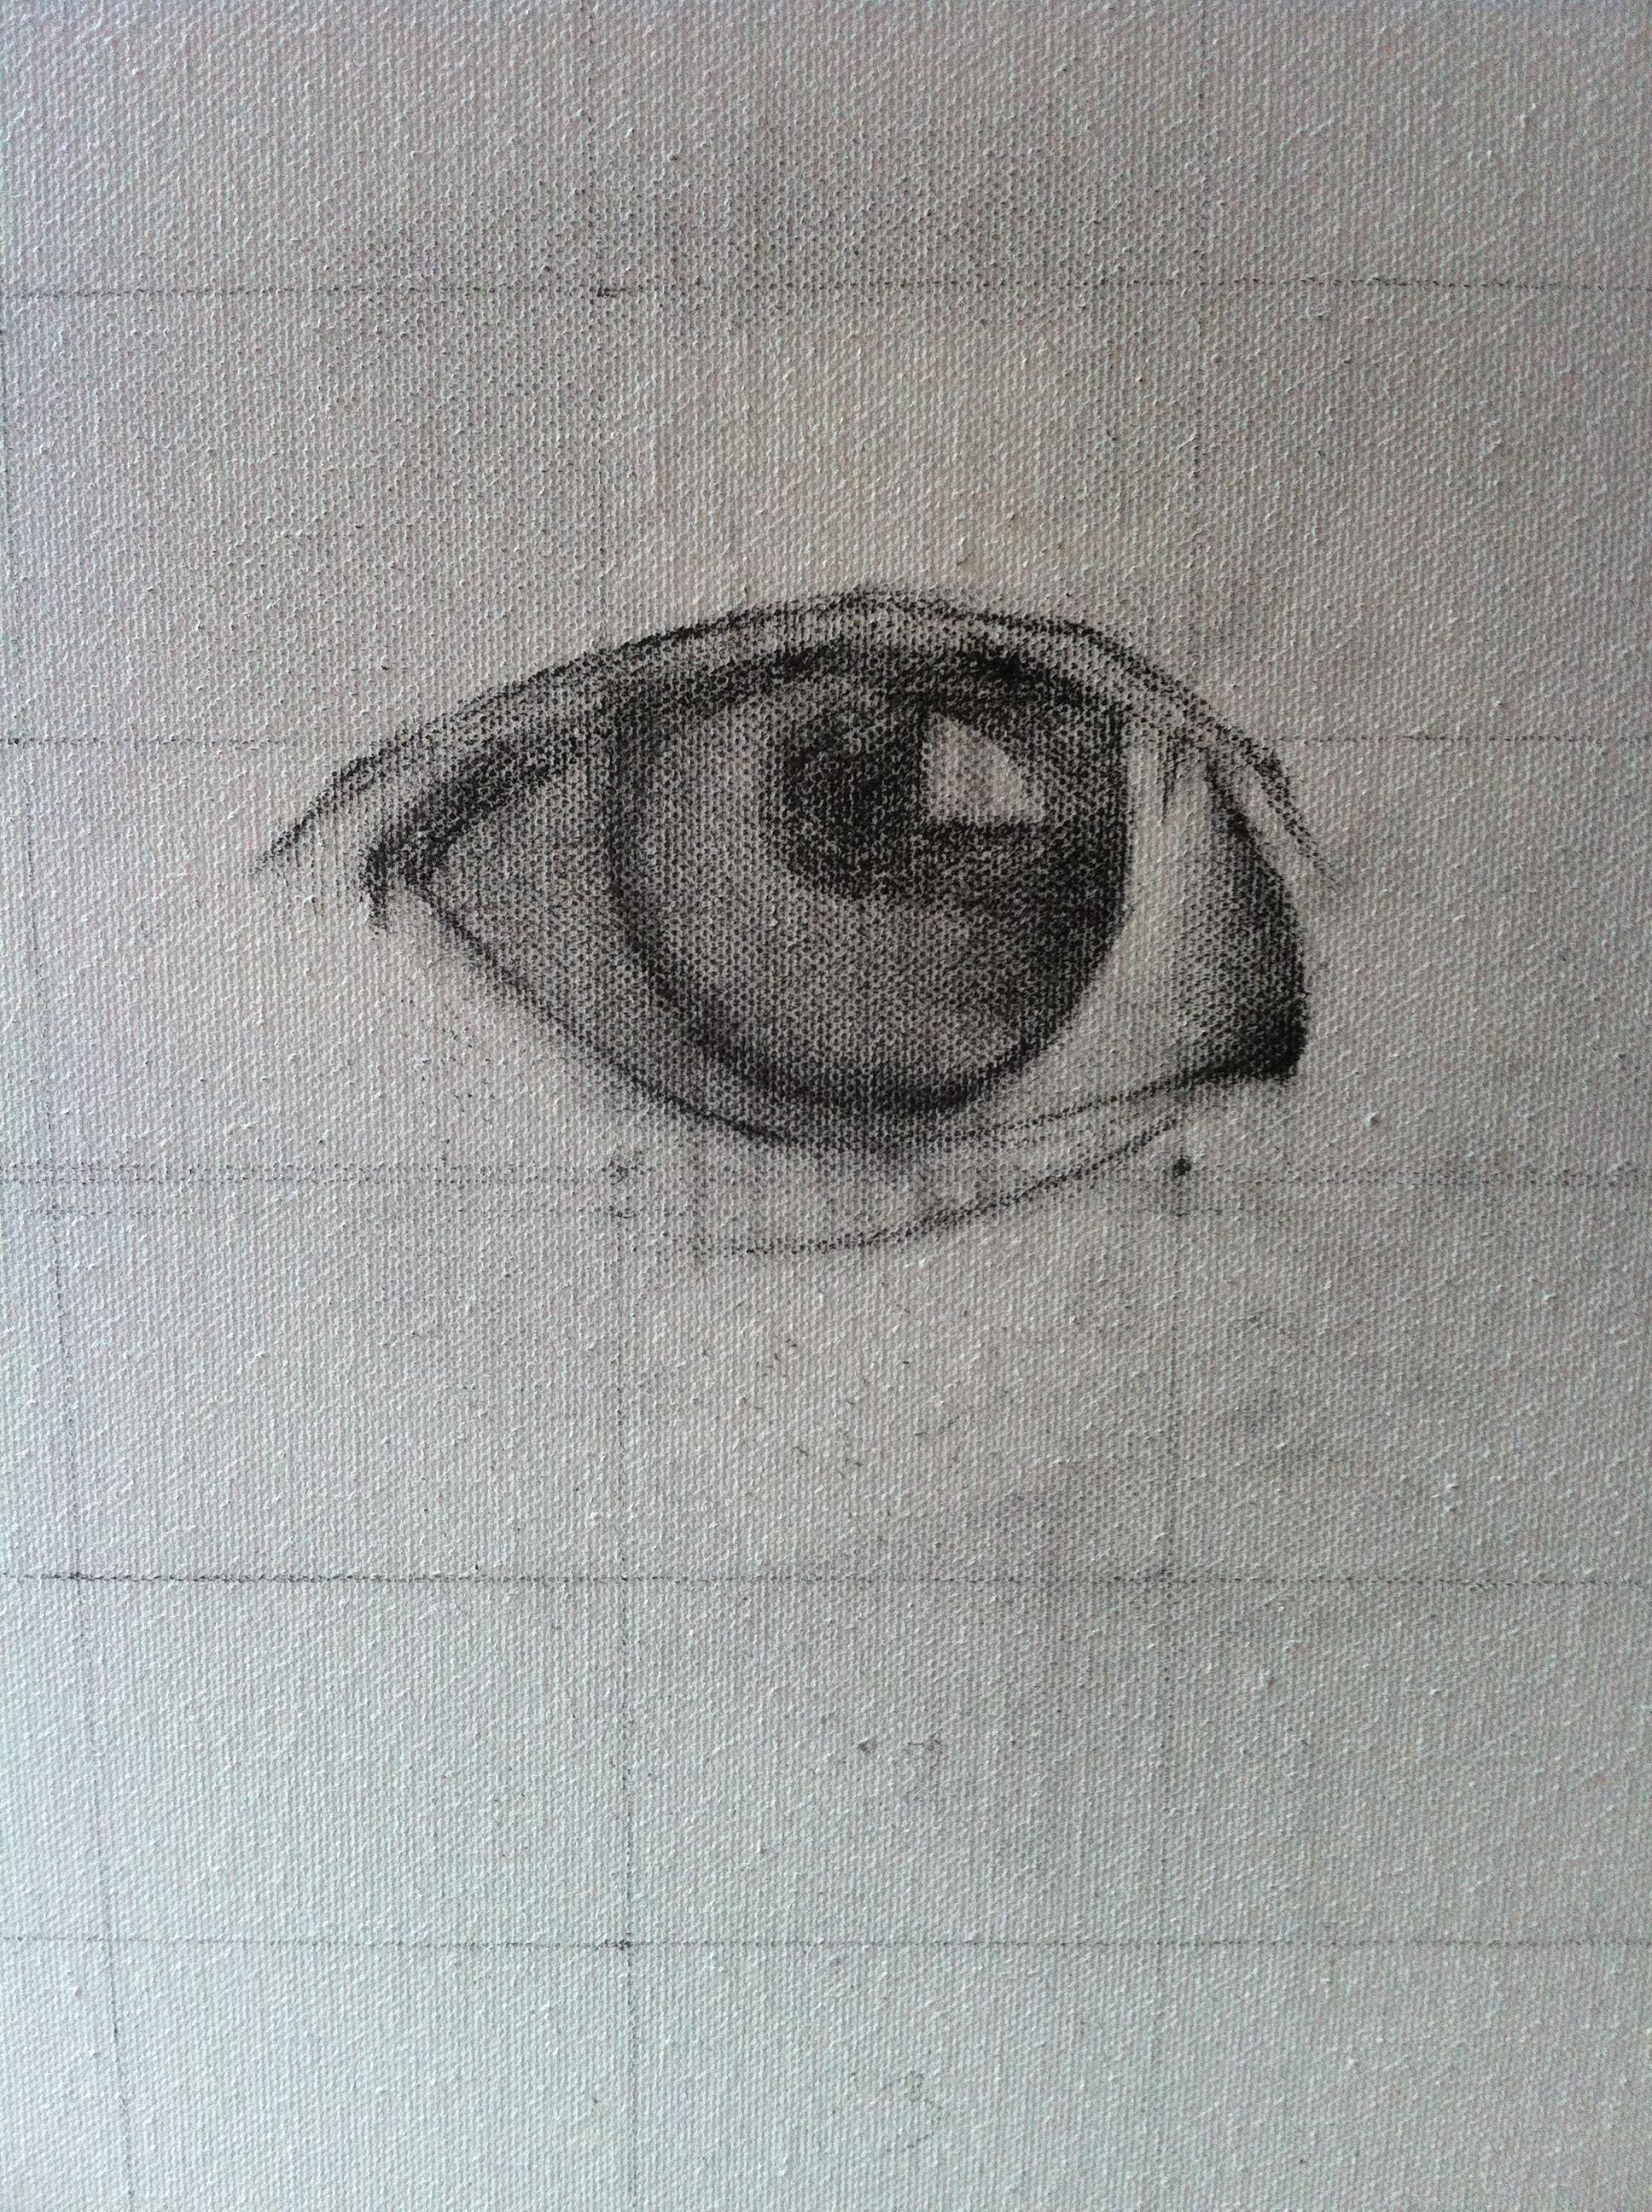 Olly eye